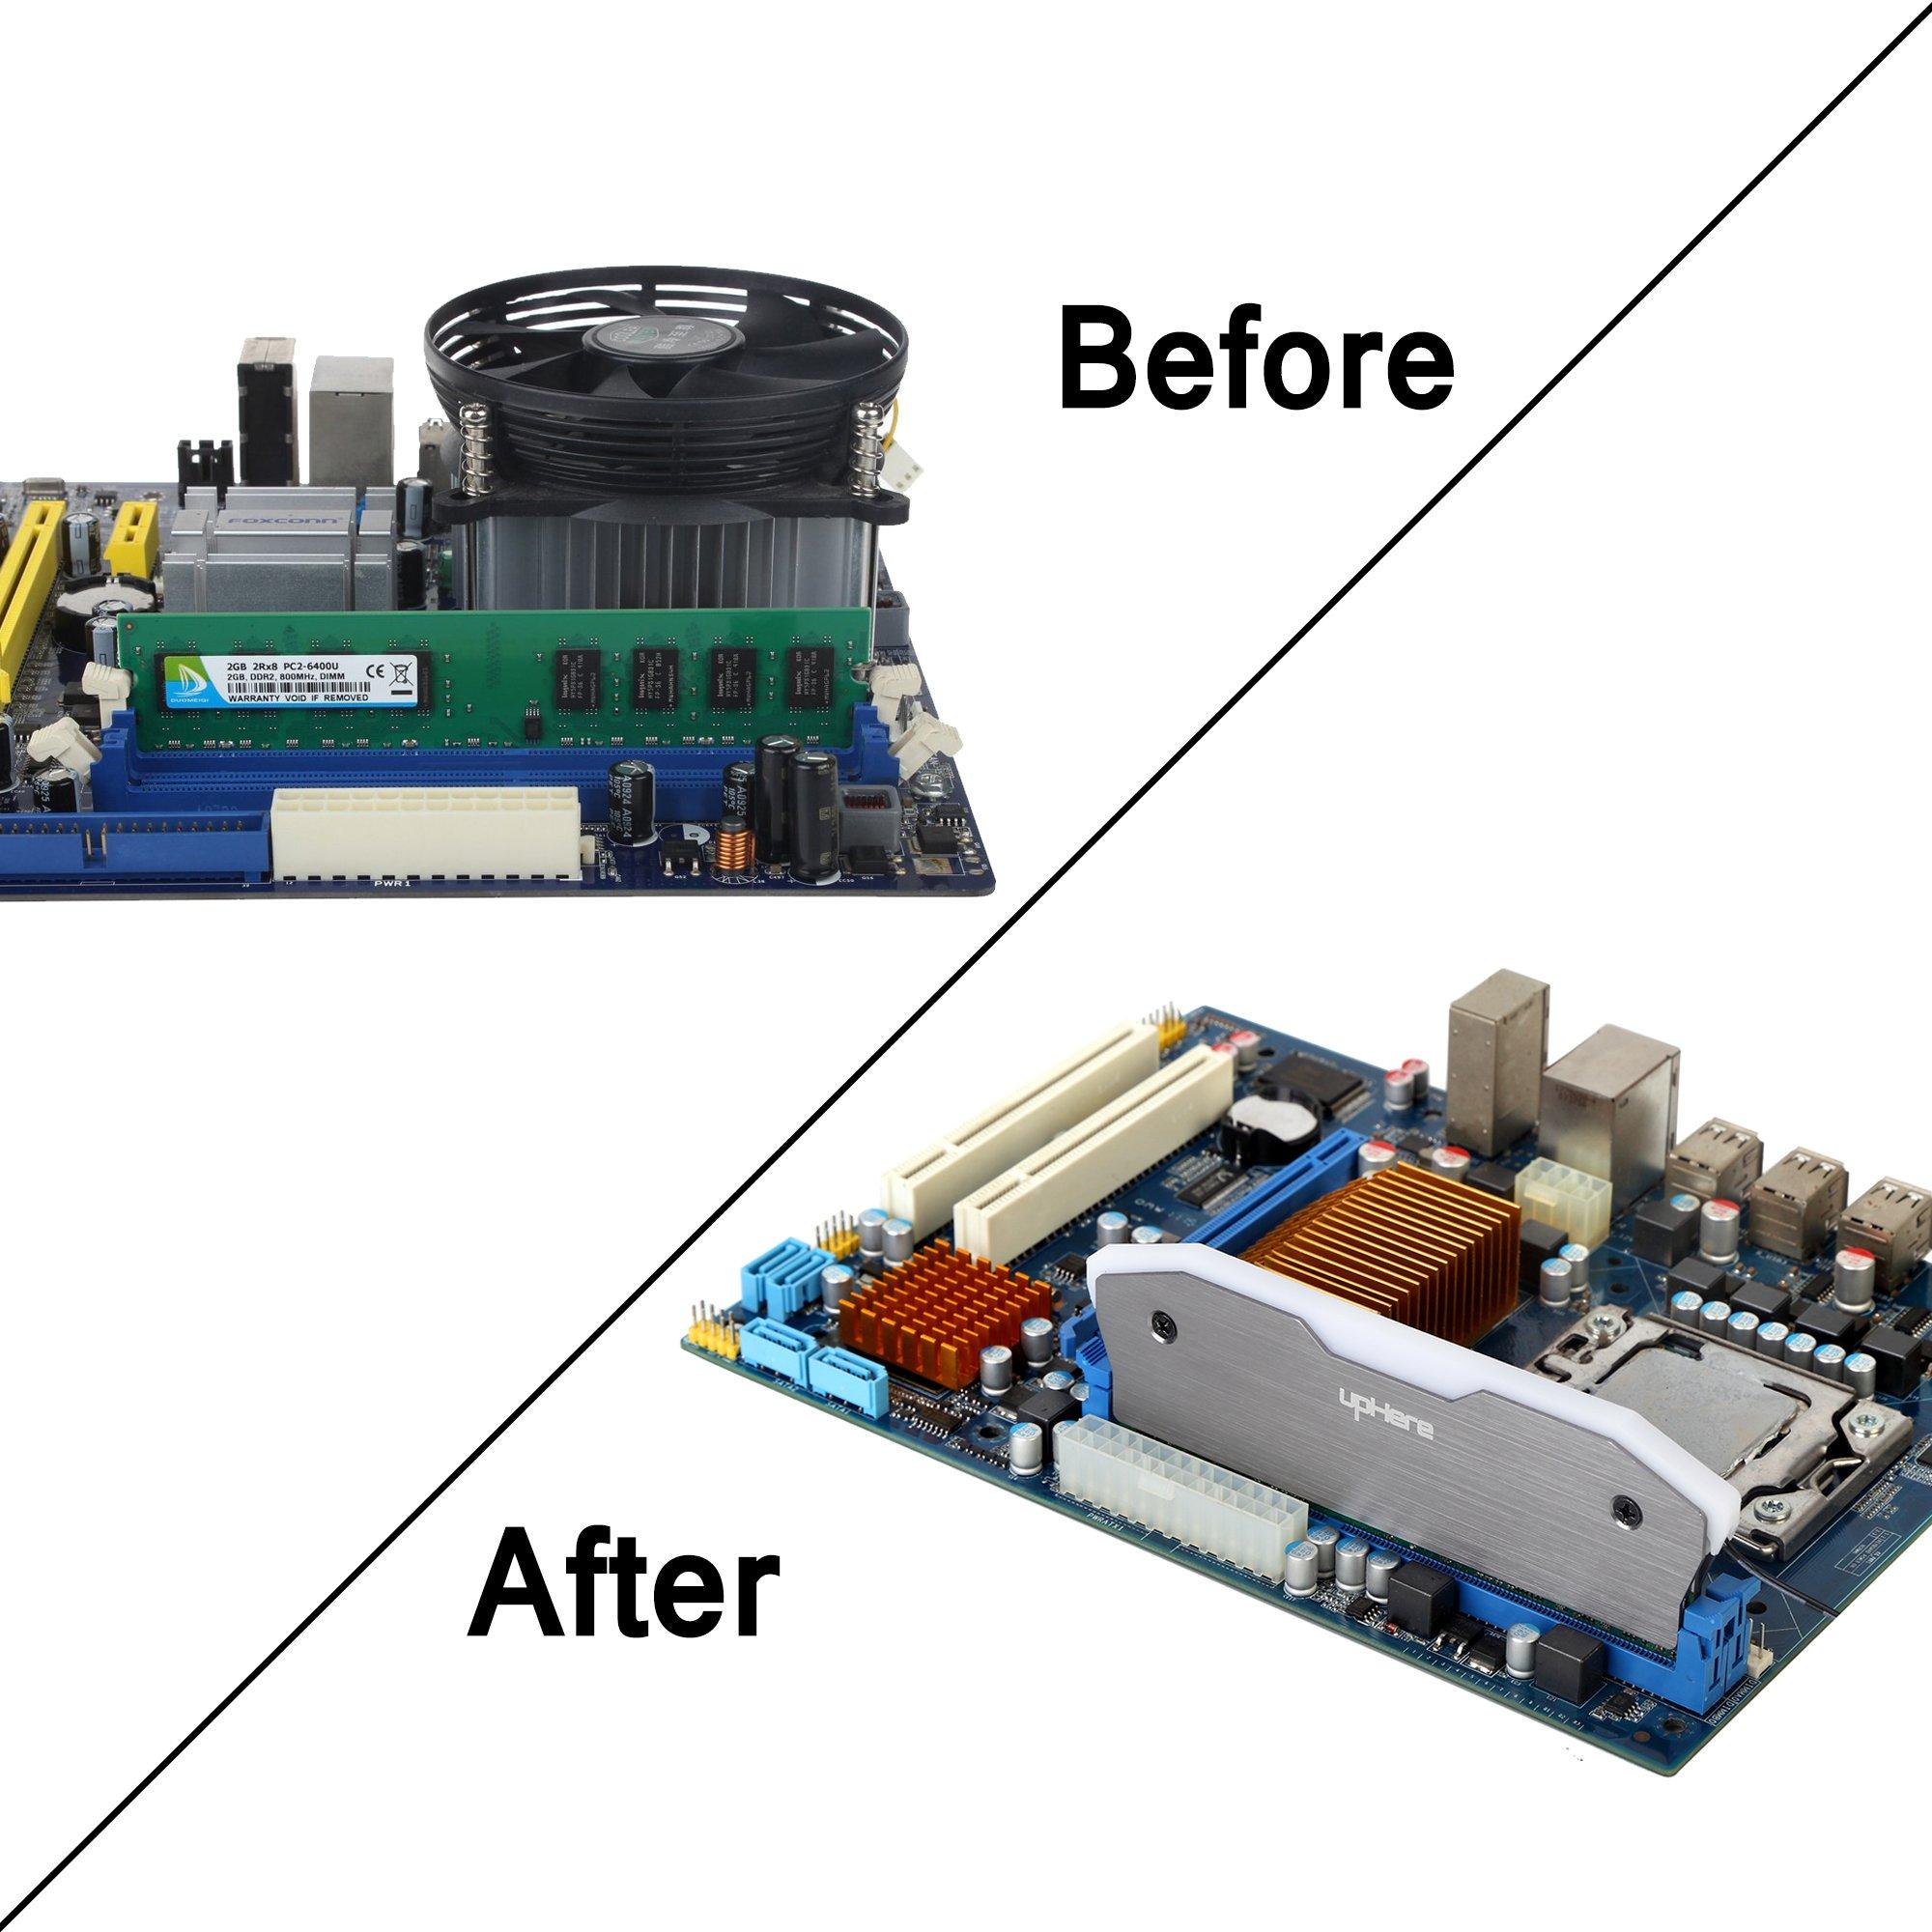 Memory RAM Black Cooler Heat Sink Cooling Vest Fin Radiation Dissipate DIY PC Game Overclocking MOD DDR DDR3 DDR4,2-Pack(MBK5-2) by upHere (Image #6)